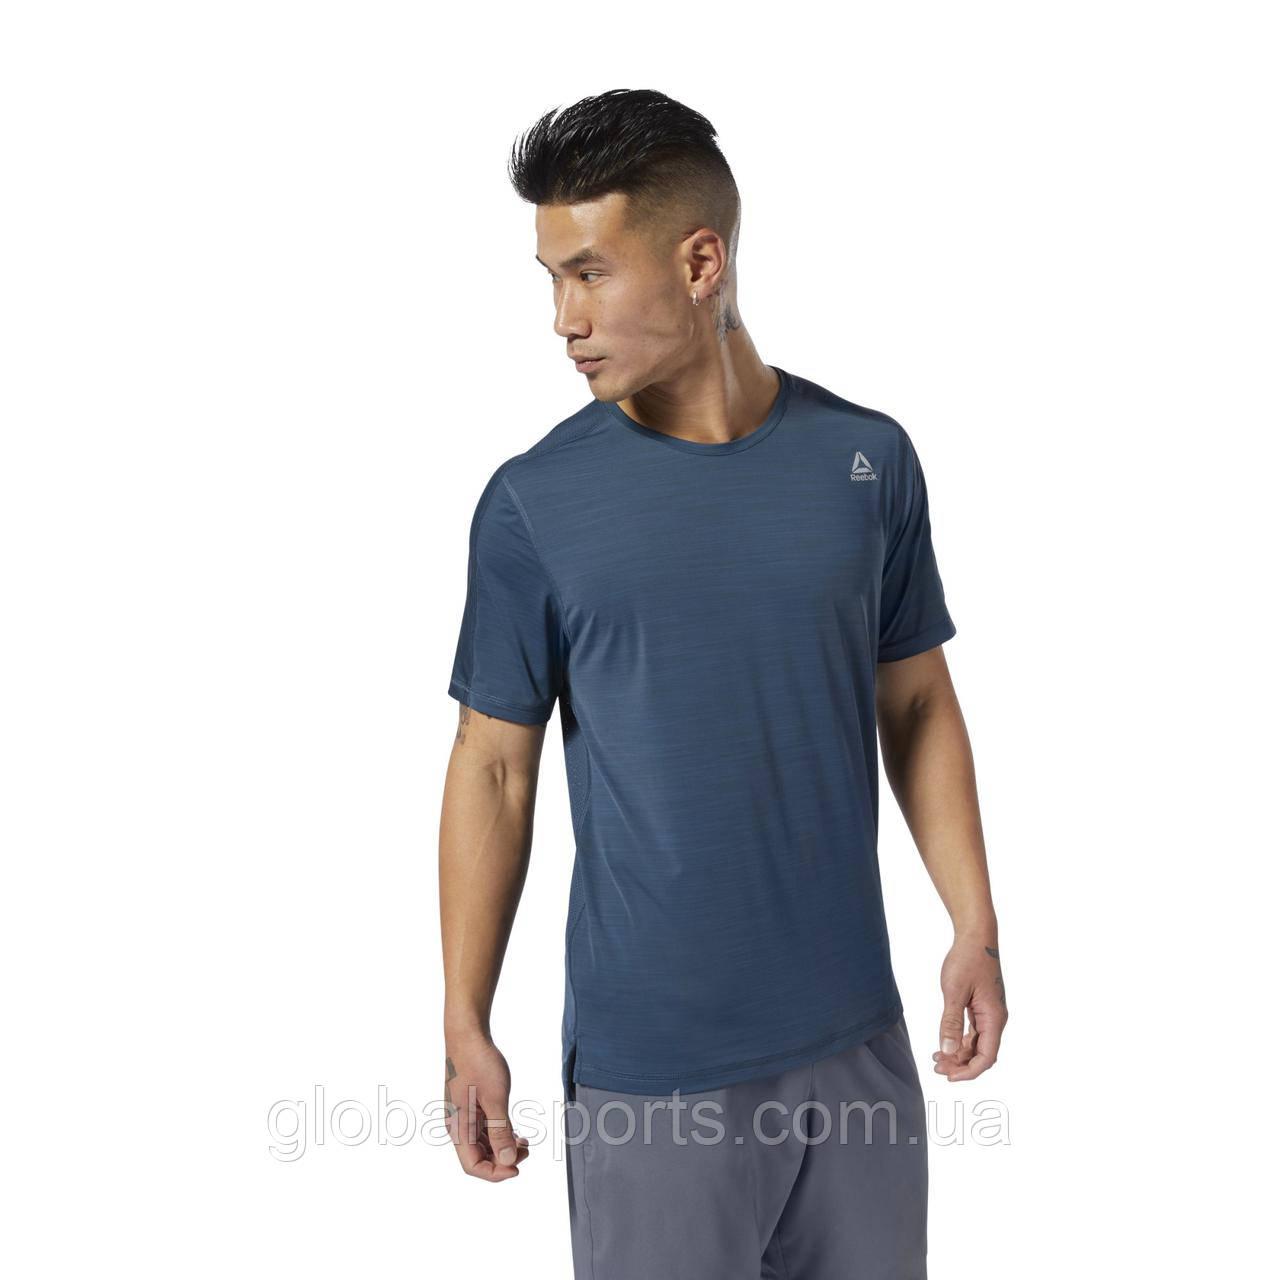 Чоловіча футболка Reebok Ost Activchill Move Tee(Артикул:DX0481)